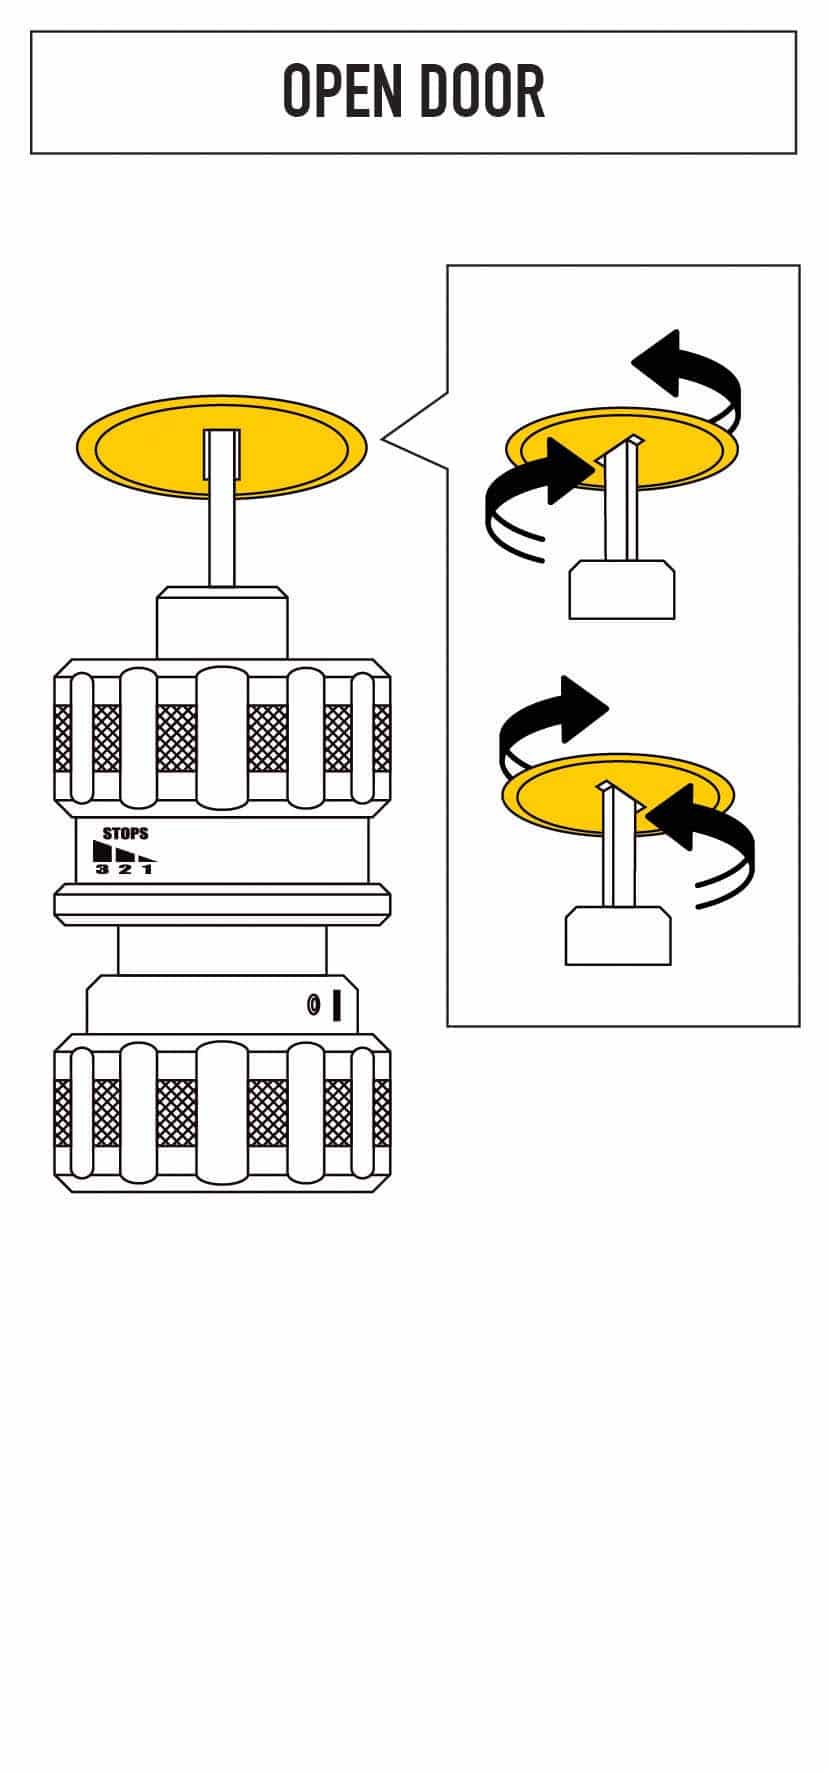 Prodecoder Instructions HU64